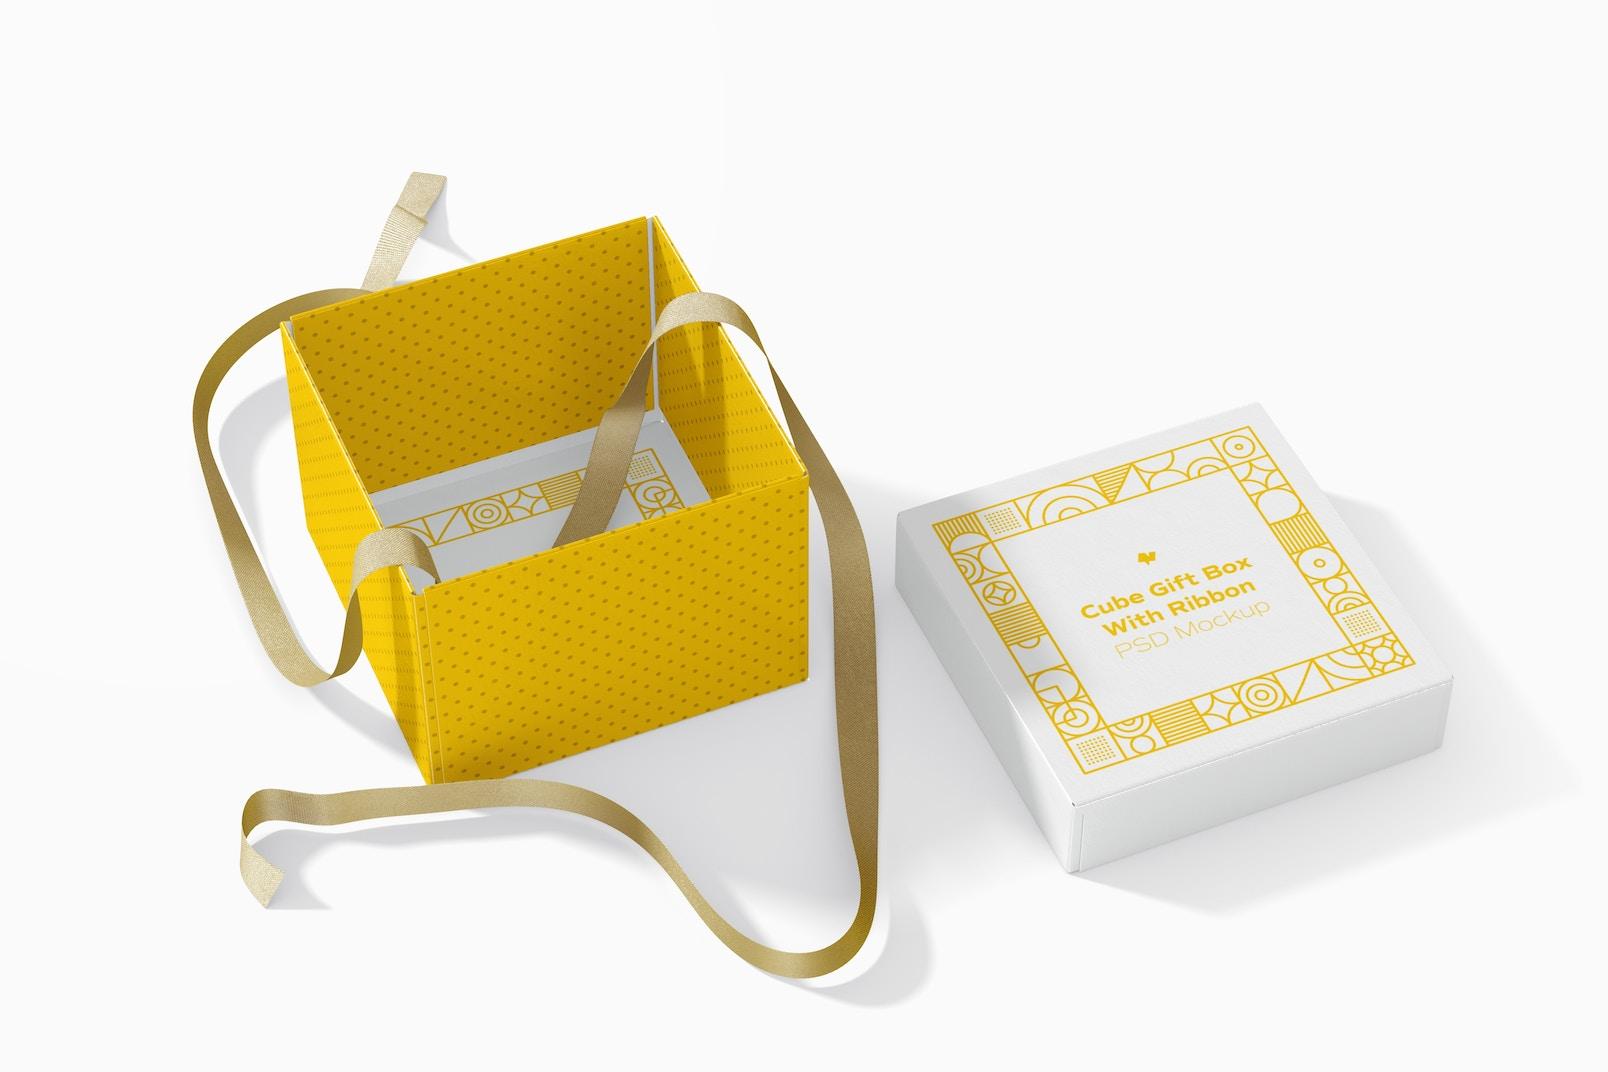 Cube Gift Box With Ribbon Mockup, Opened